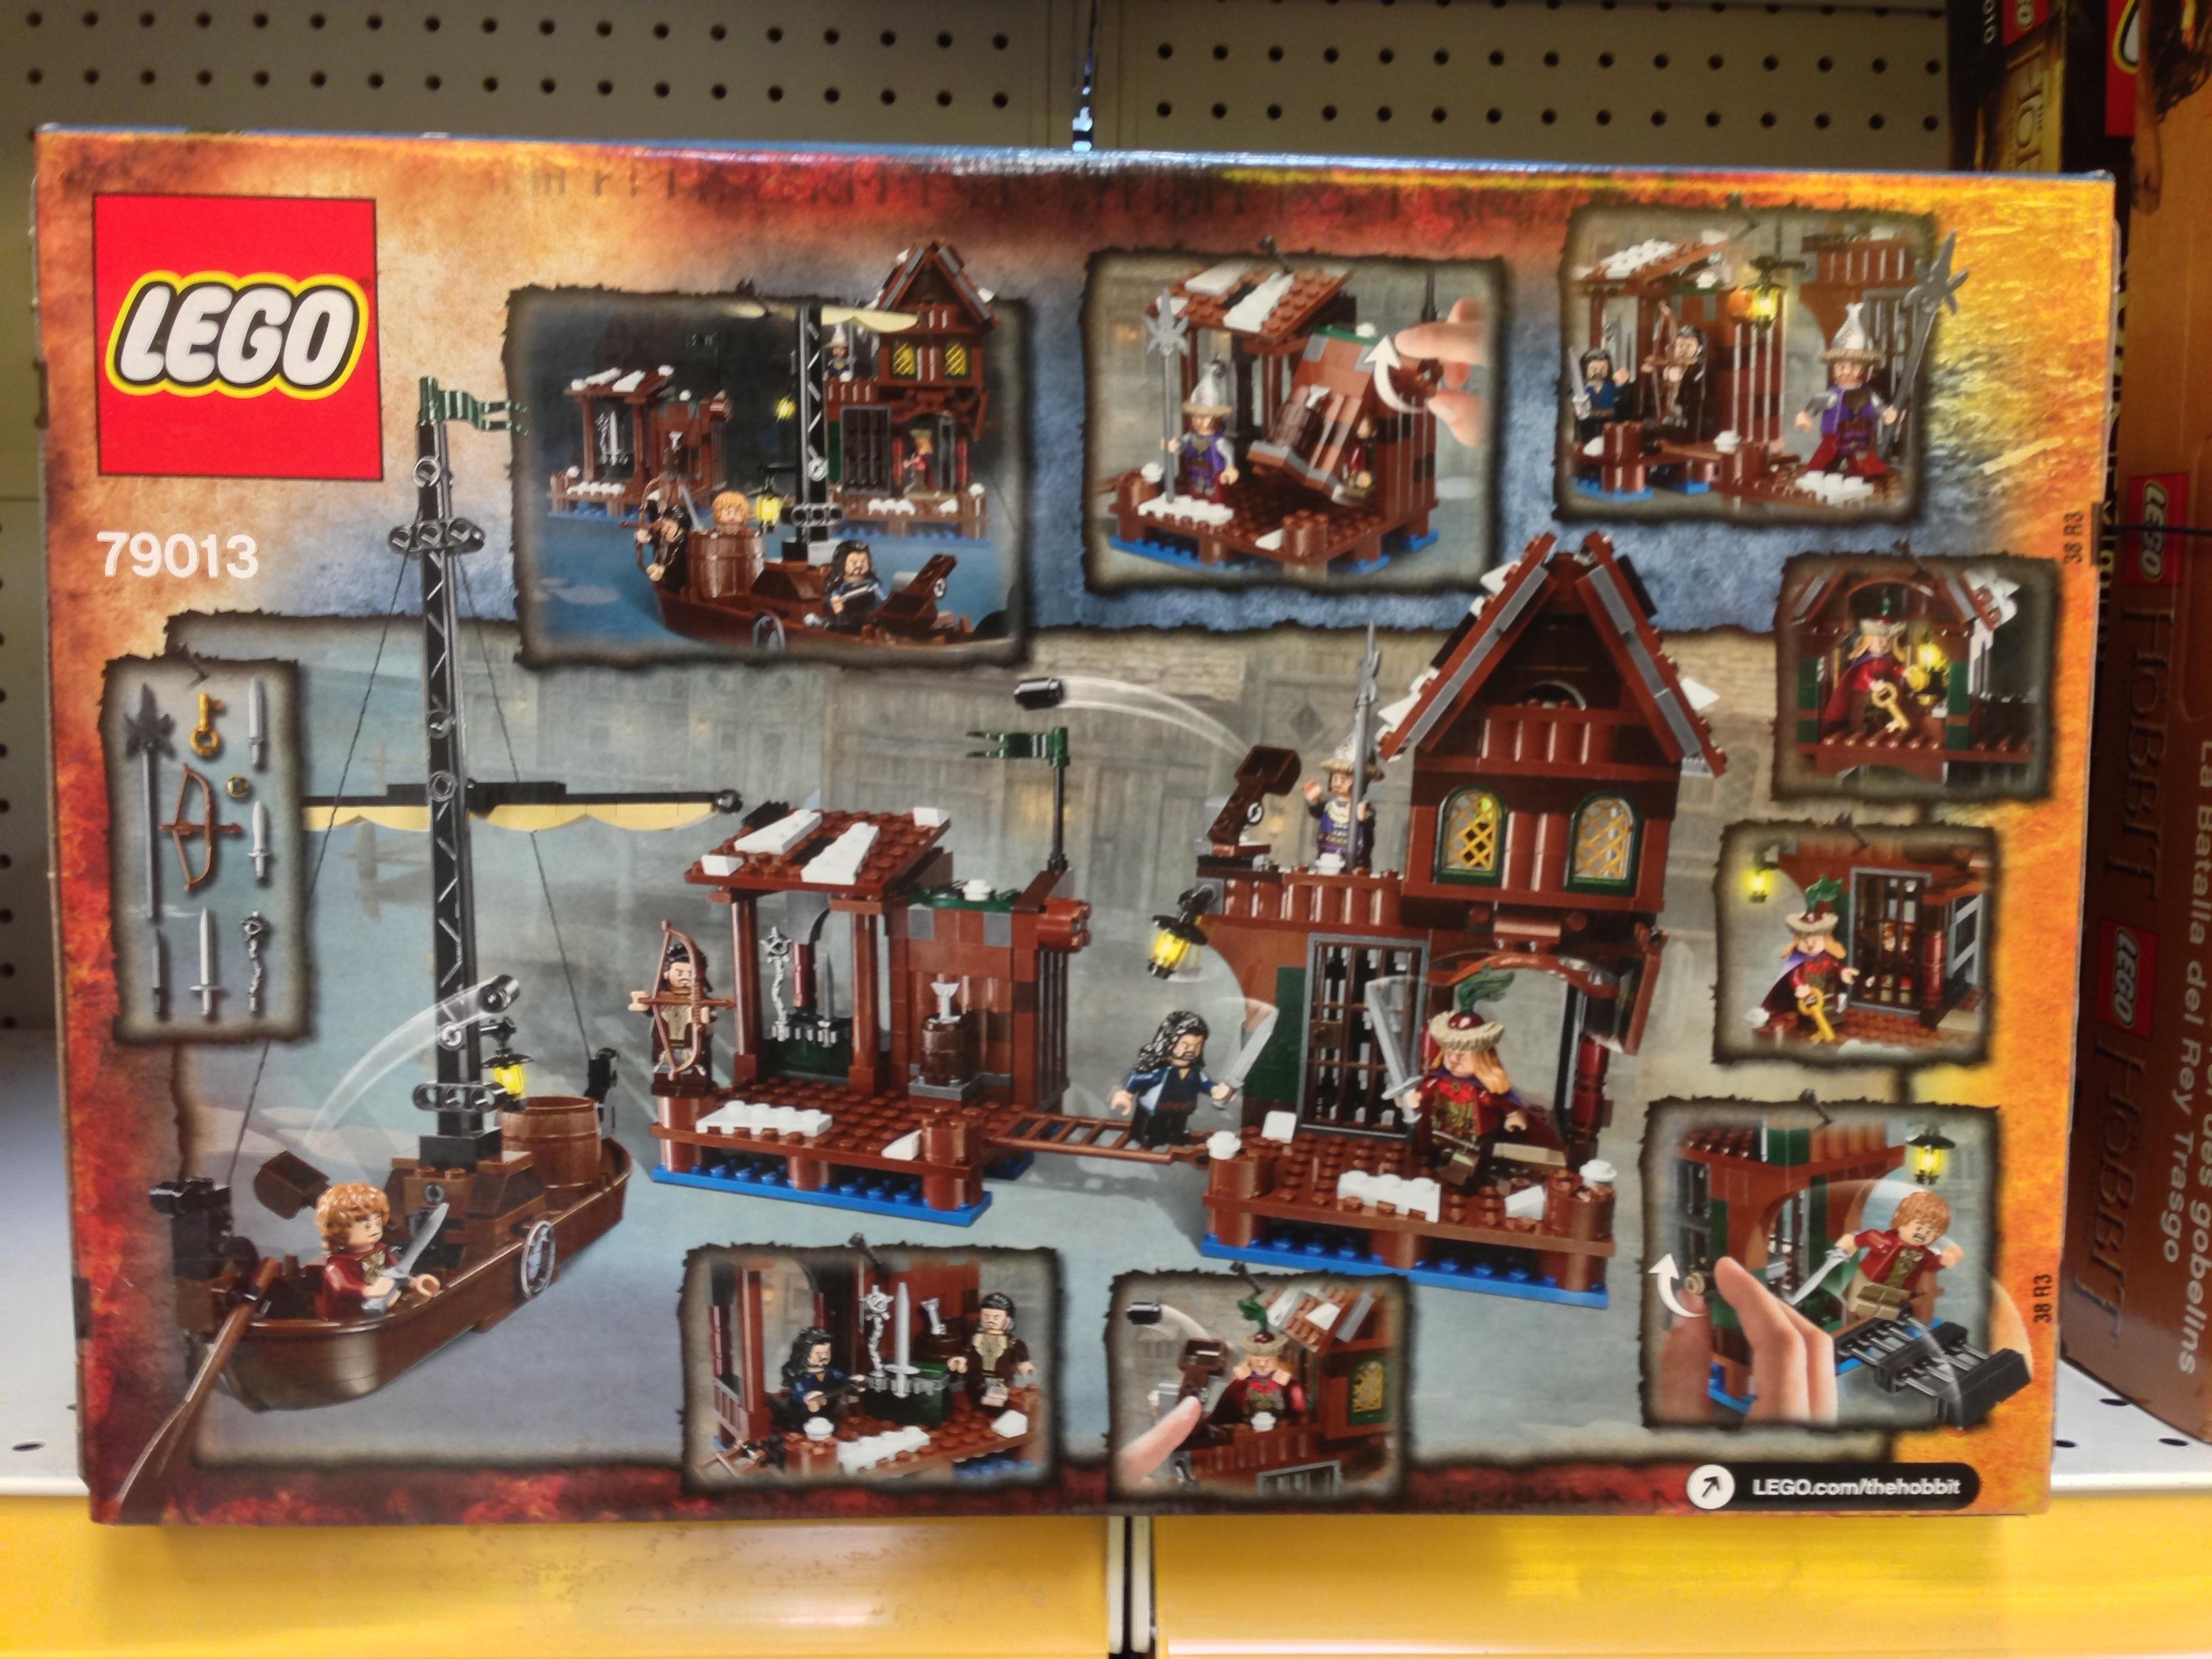 The Sets Hobbit Of PhotosBricks Smaug Lego Desolation Releasedamp; TPiXOkZu